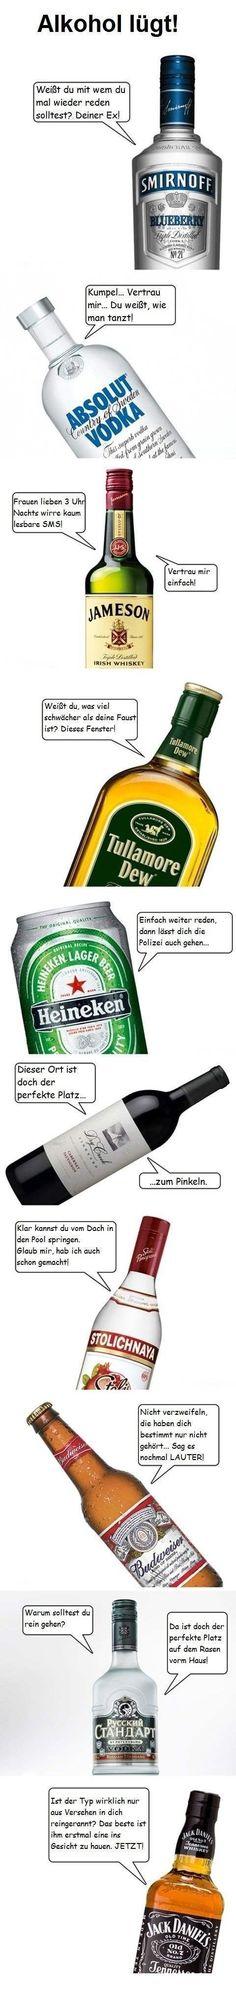 Alkohol lügt LocoPengu - Why so serious?